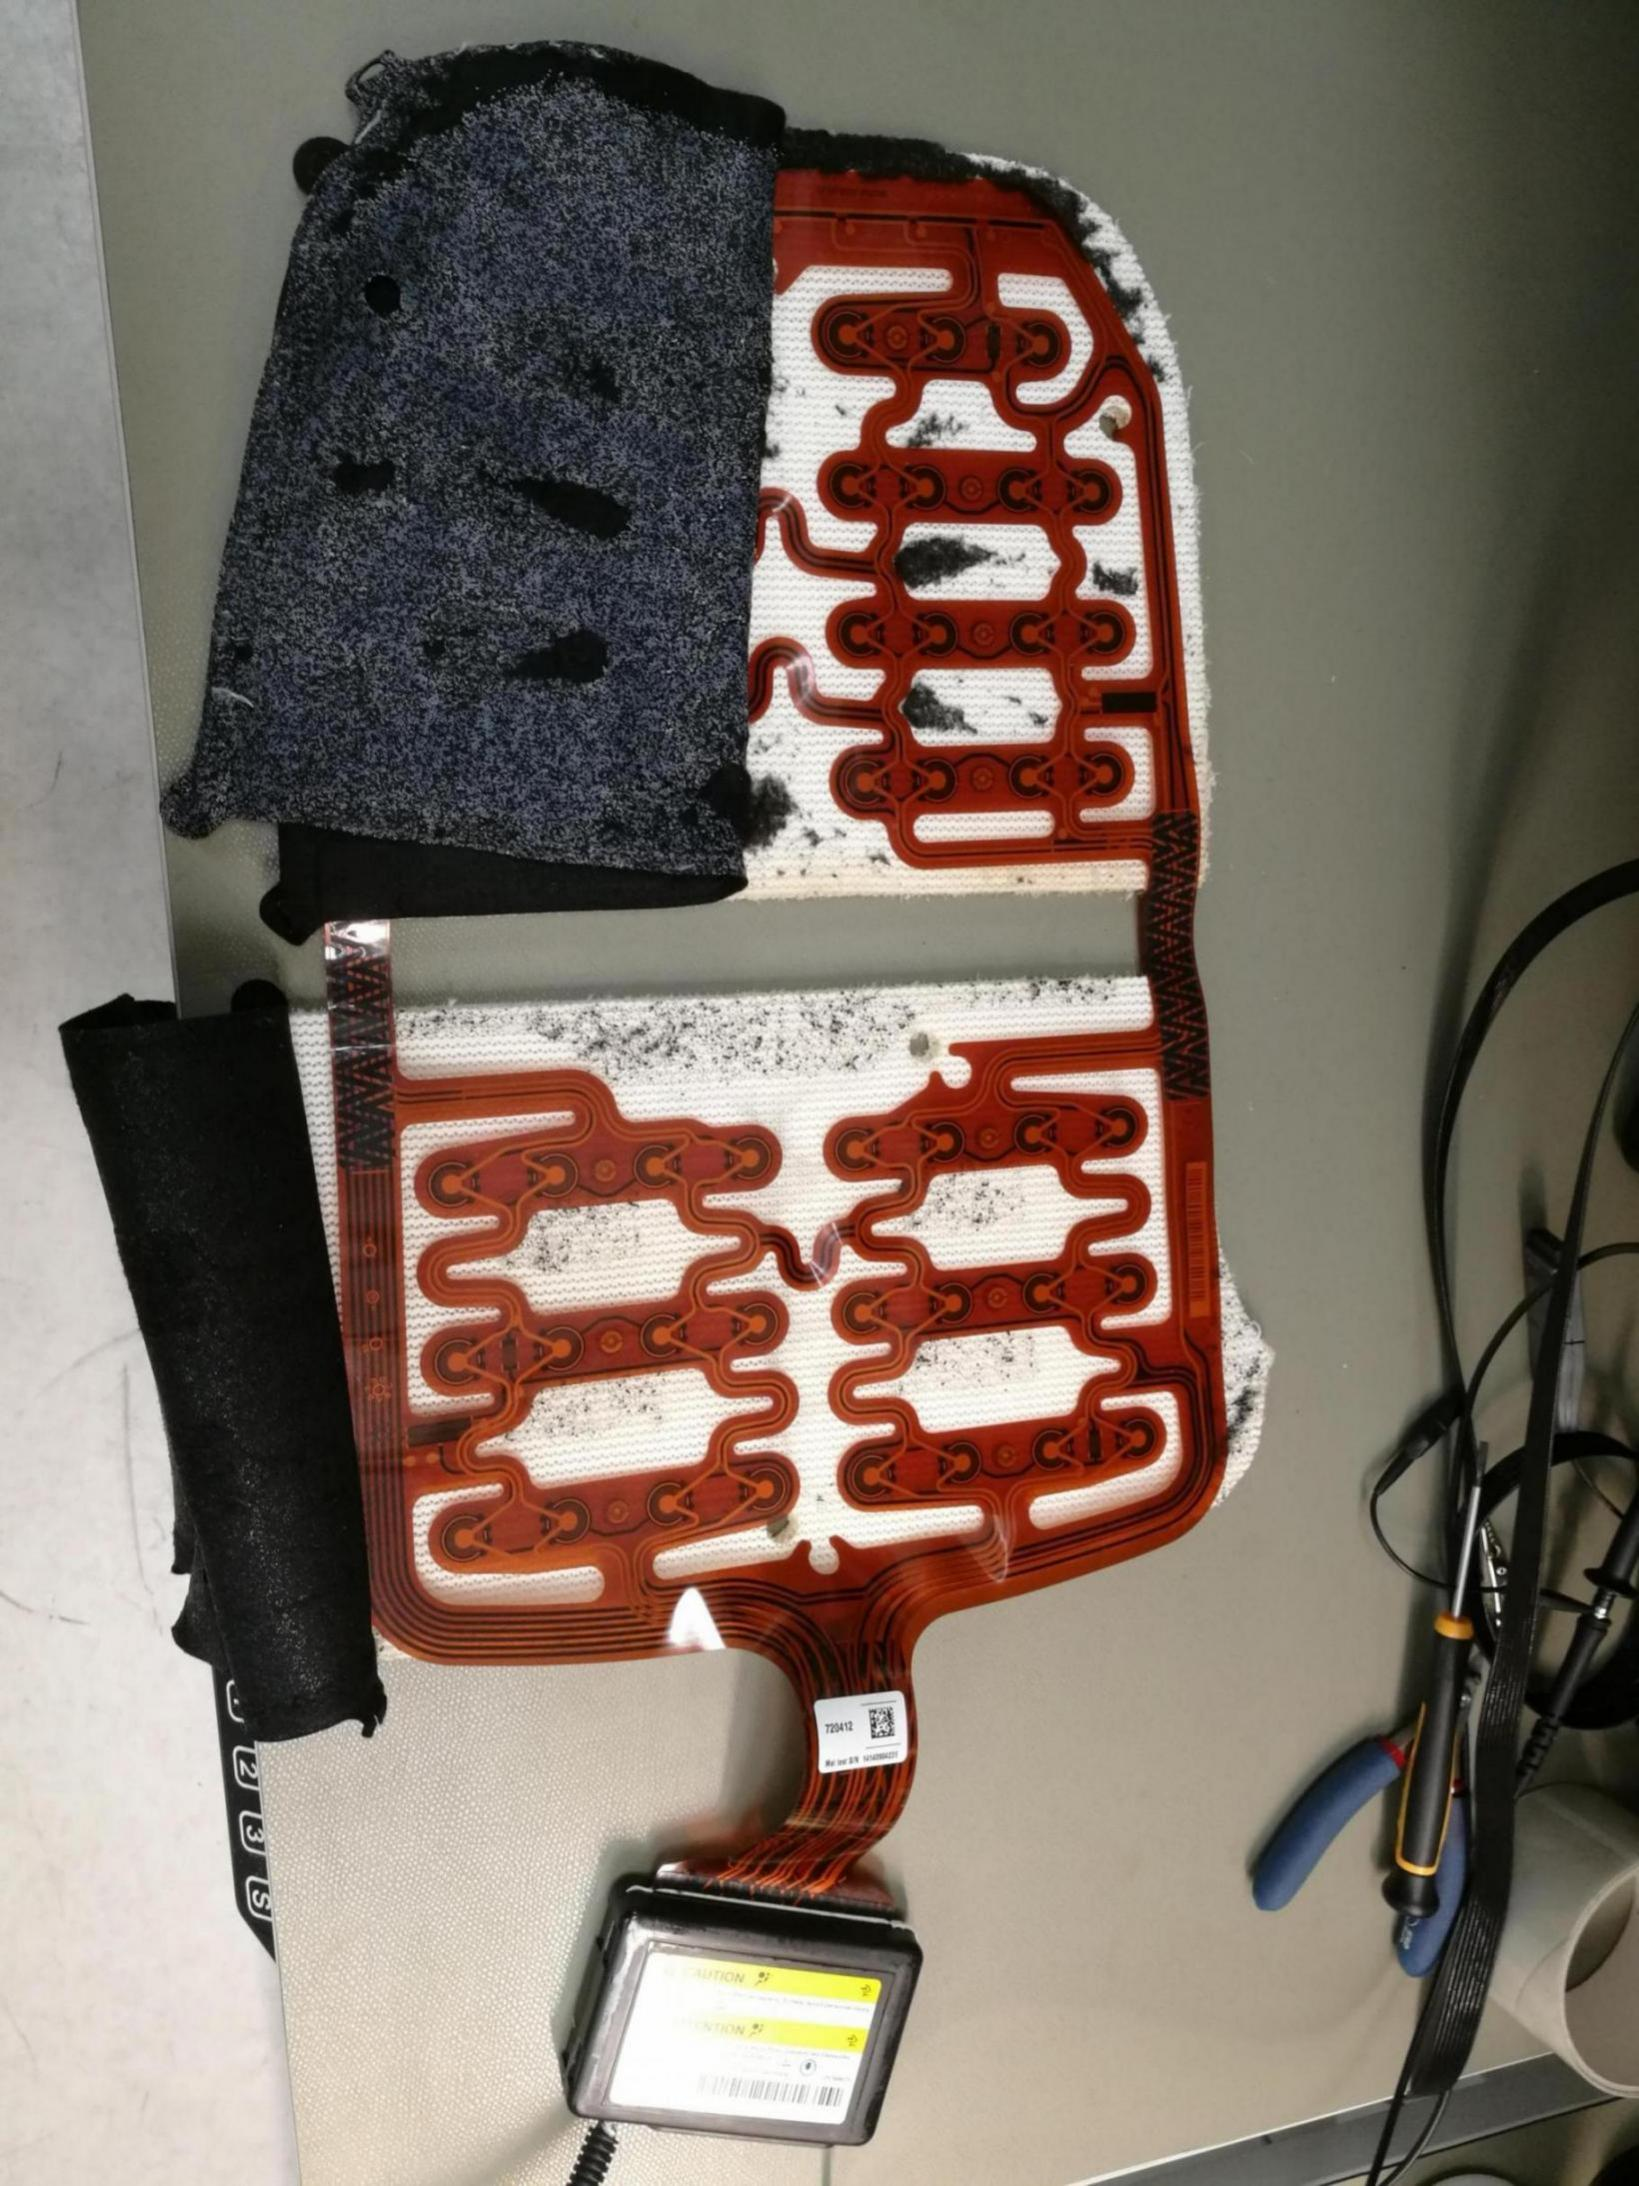 Airbag360 installed - Service Airbag DTC still present